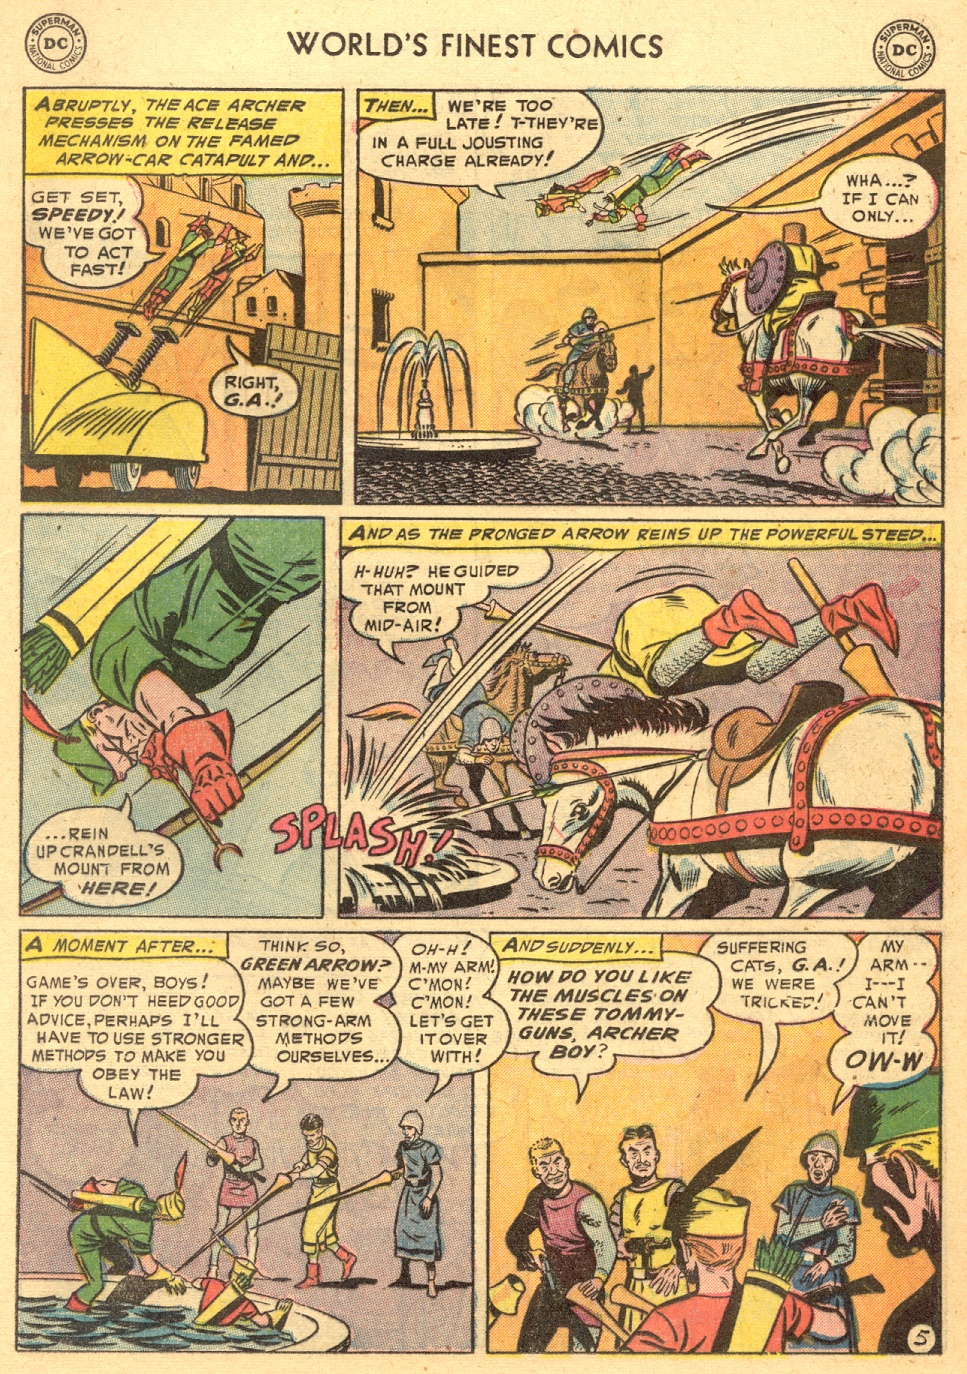 Read online World's Finest Comics comic -  Issue #70 - 25